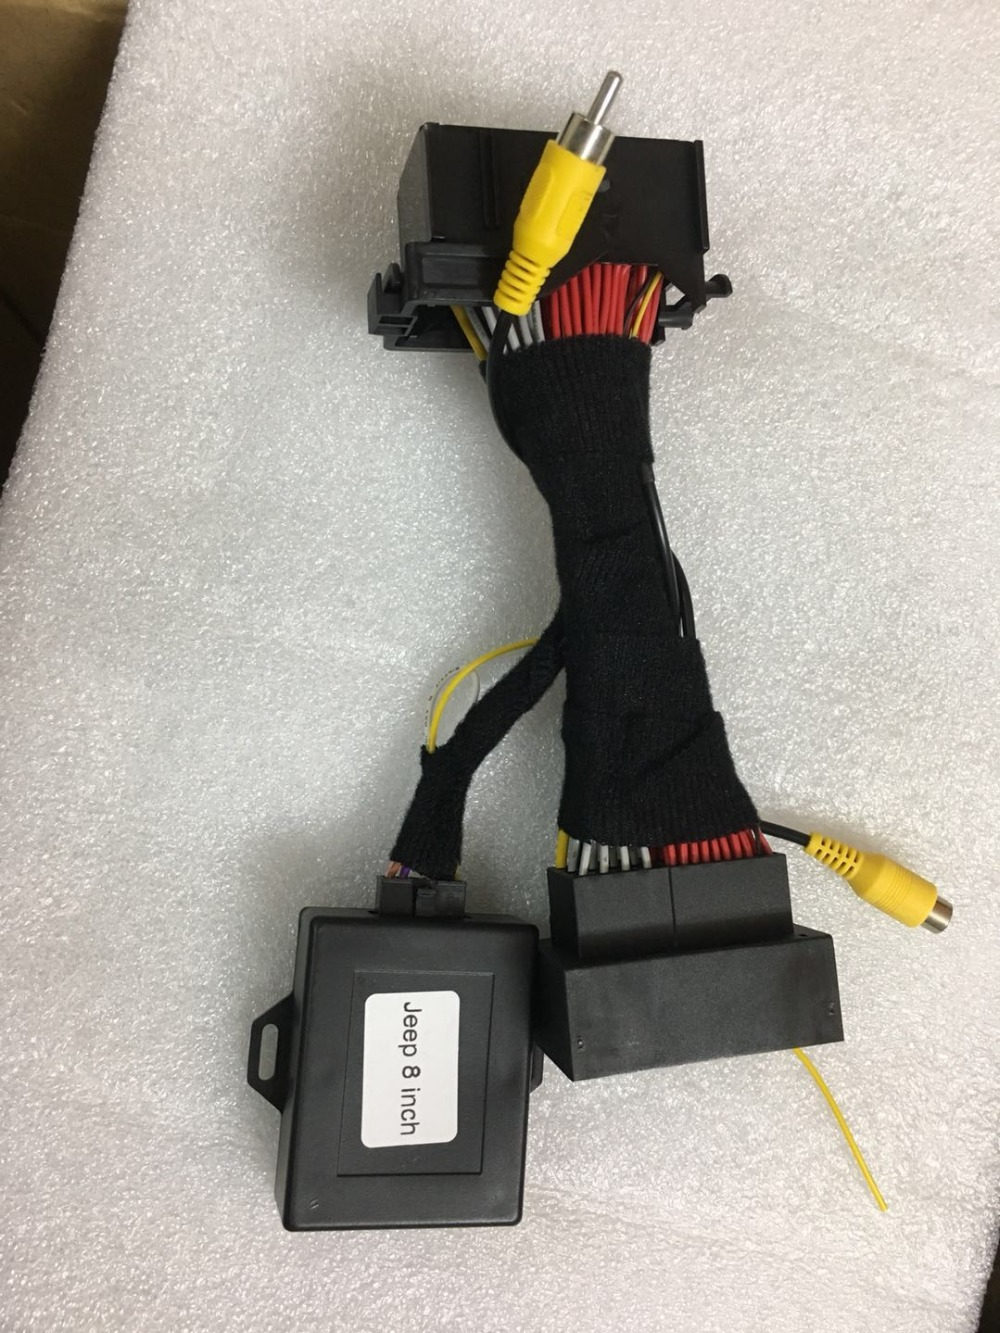 [SCHEMATICS_4HG]  Bmw 5 Series E39 9503 Boot Lid Wiring Harness Loom Repair Kit New 2008 F150  Wiring Diagram International Pickup Starter Wiring Schematics -  rise.123vielgeld.de | Triumph Wiring Harness Repair Tape |  | Wires